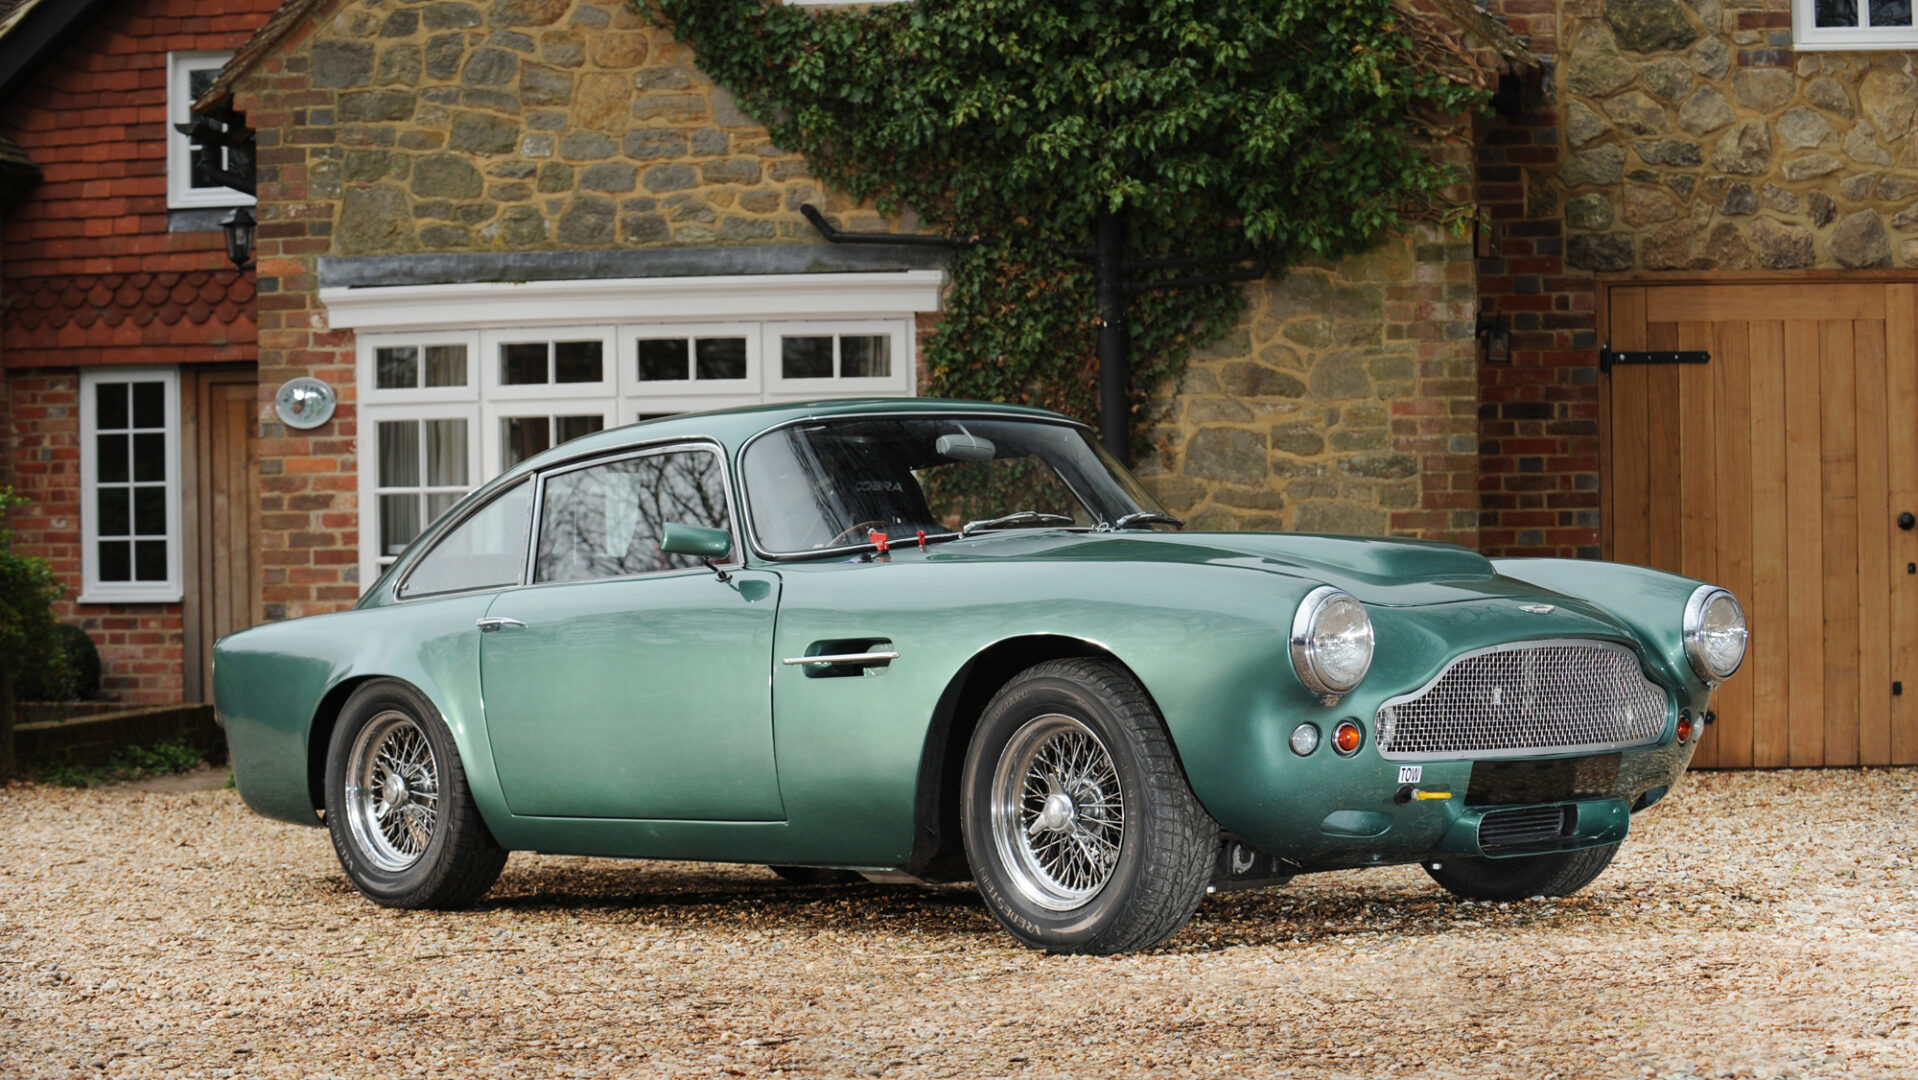 B Aston Martin Db4 Gt Simon Clay1